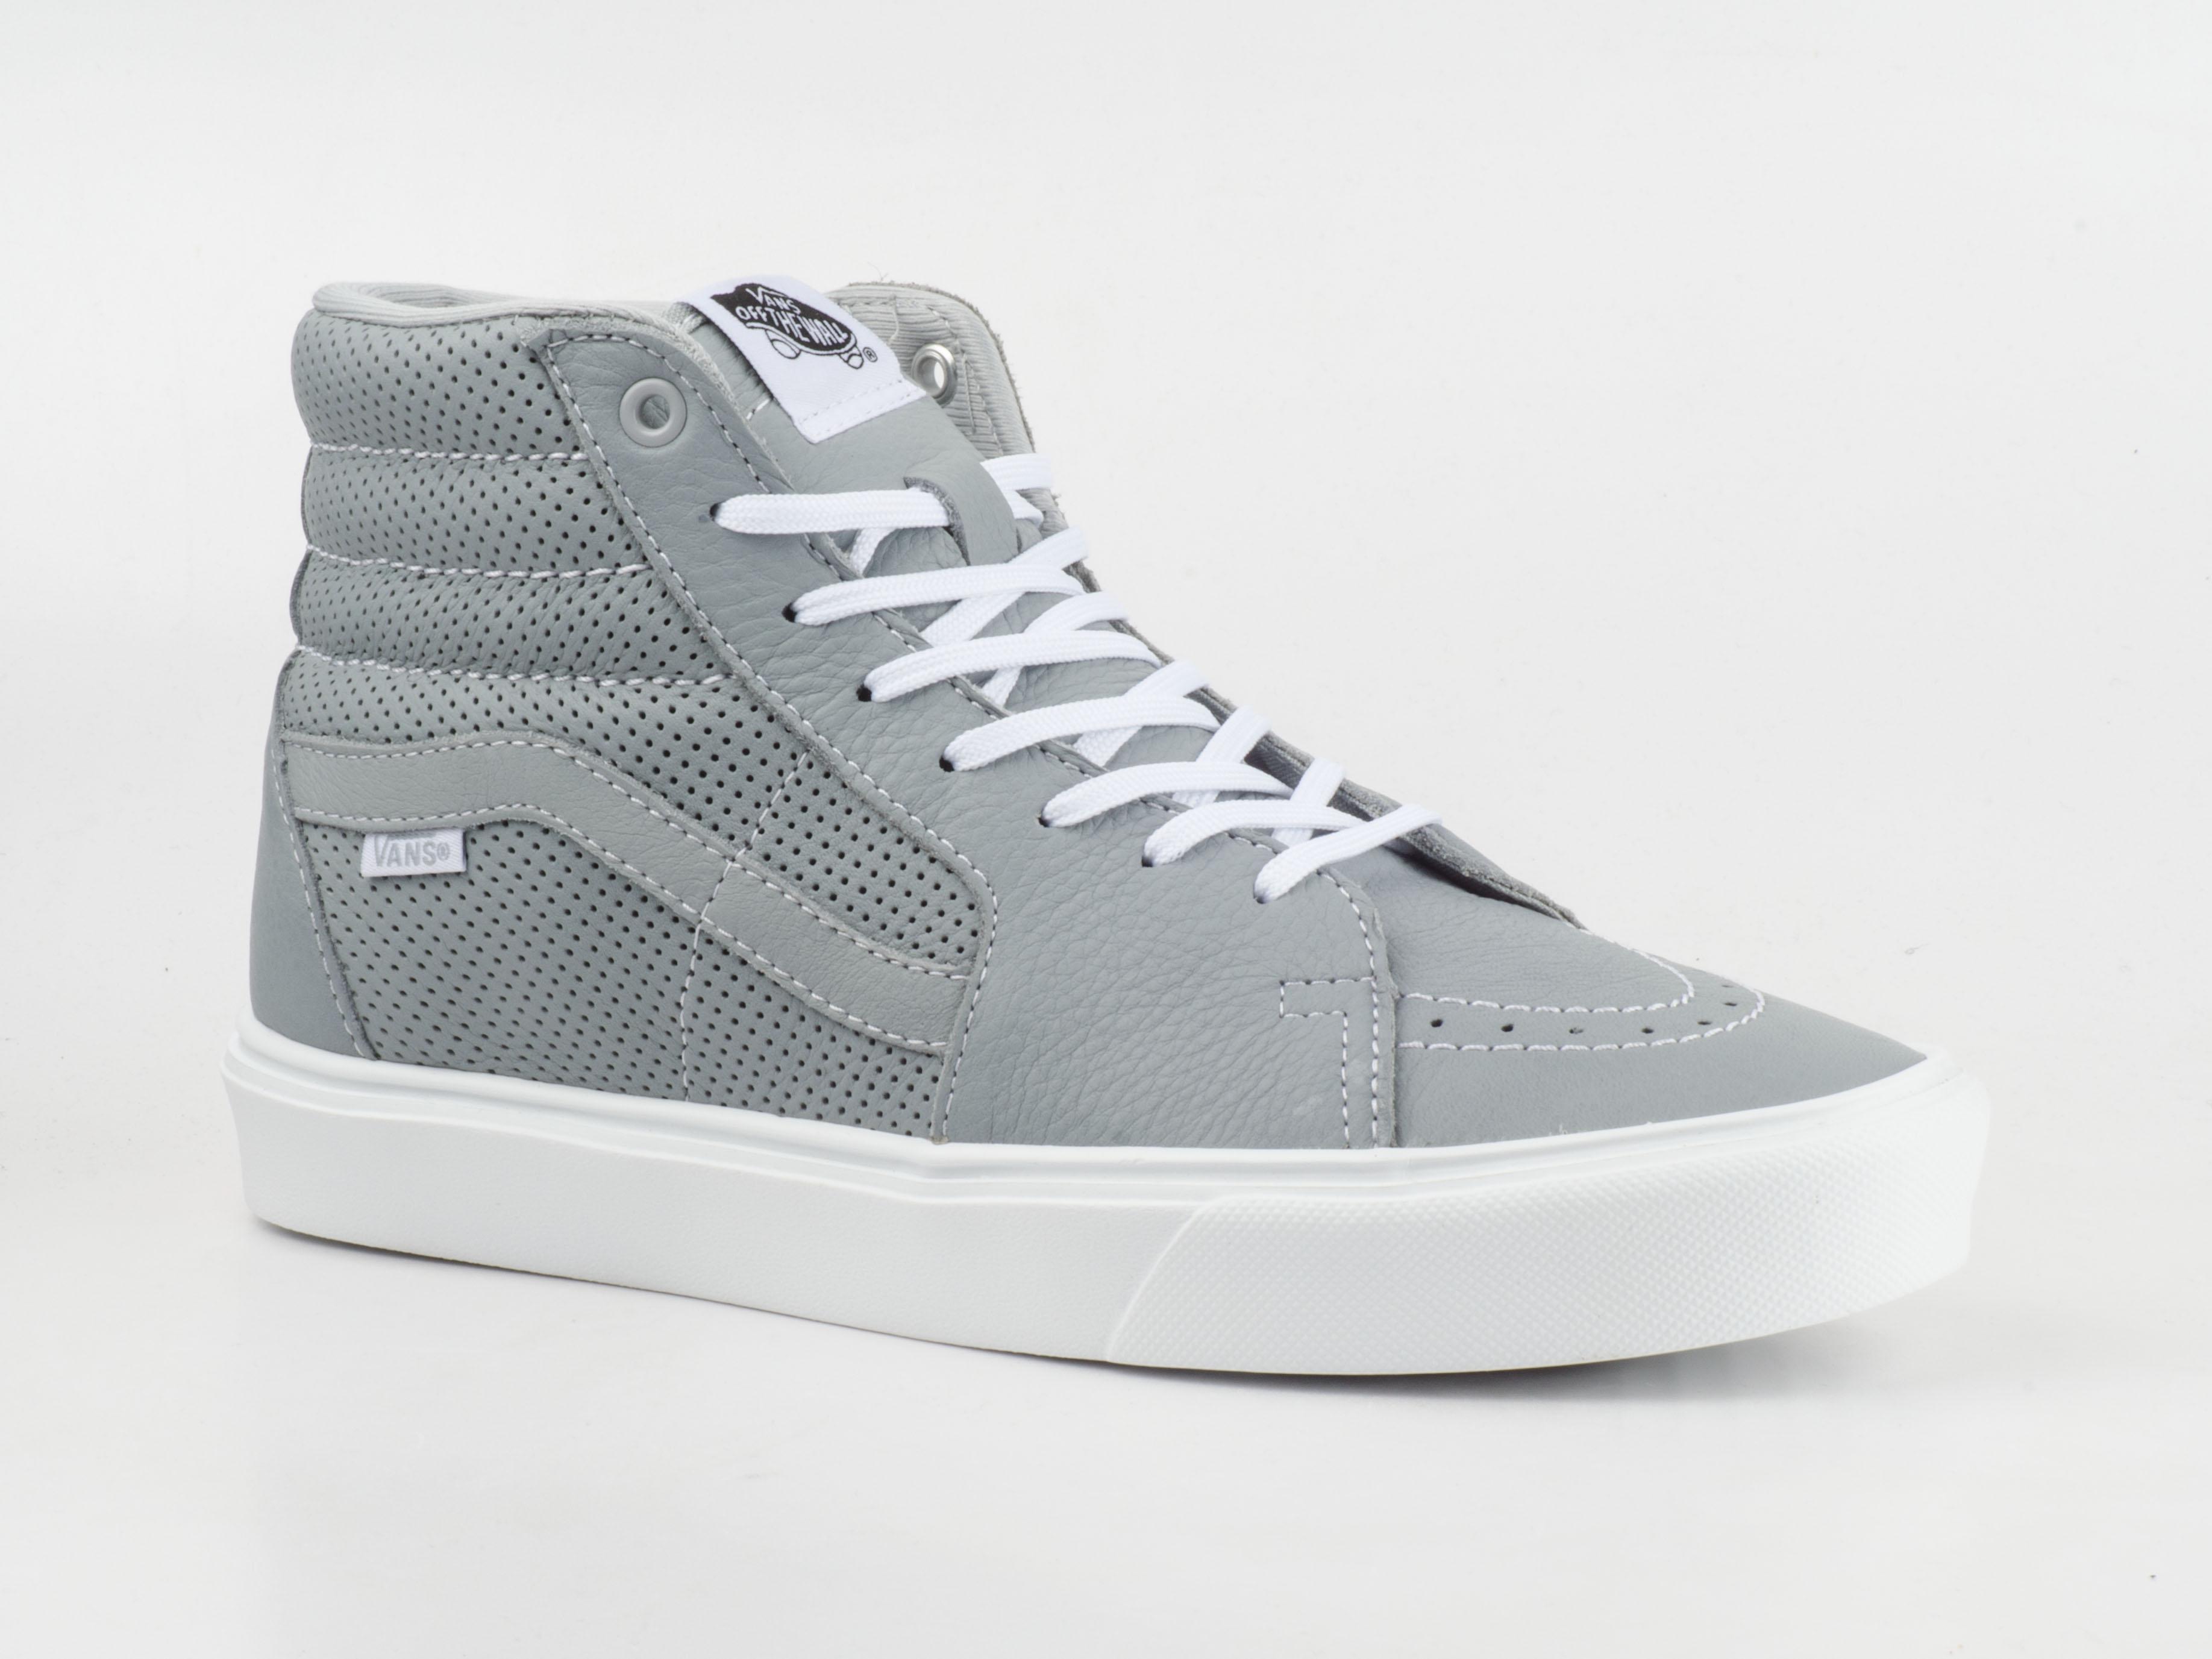 vans schuhe sneaker sk8 hi lite vxe4fji skater grau wei. Black Bedroom Furniture Sets. Home Design Ideas